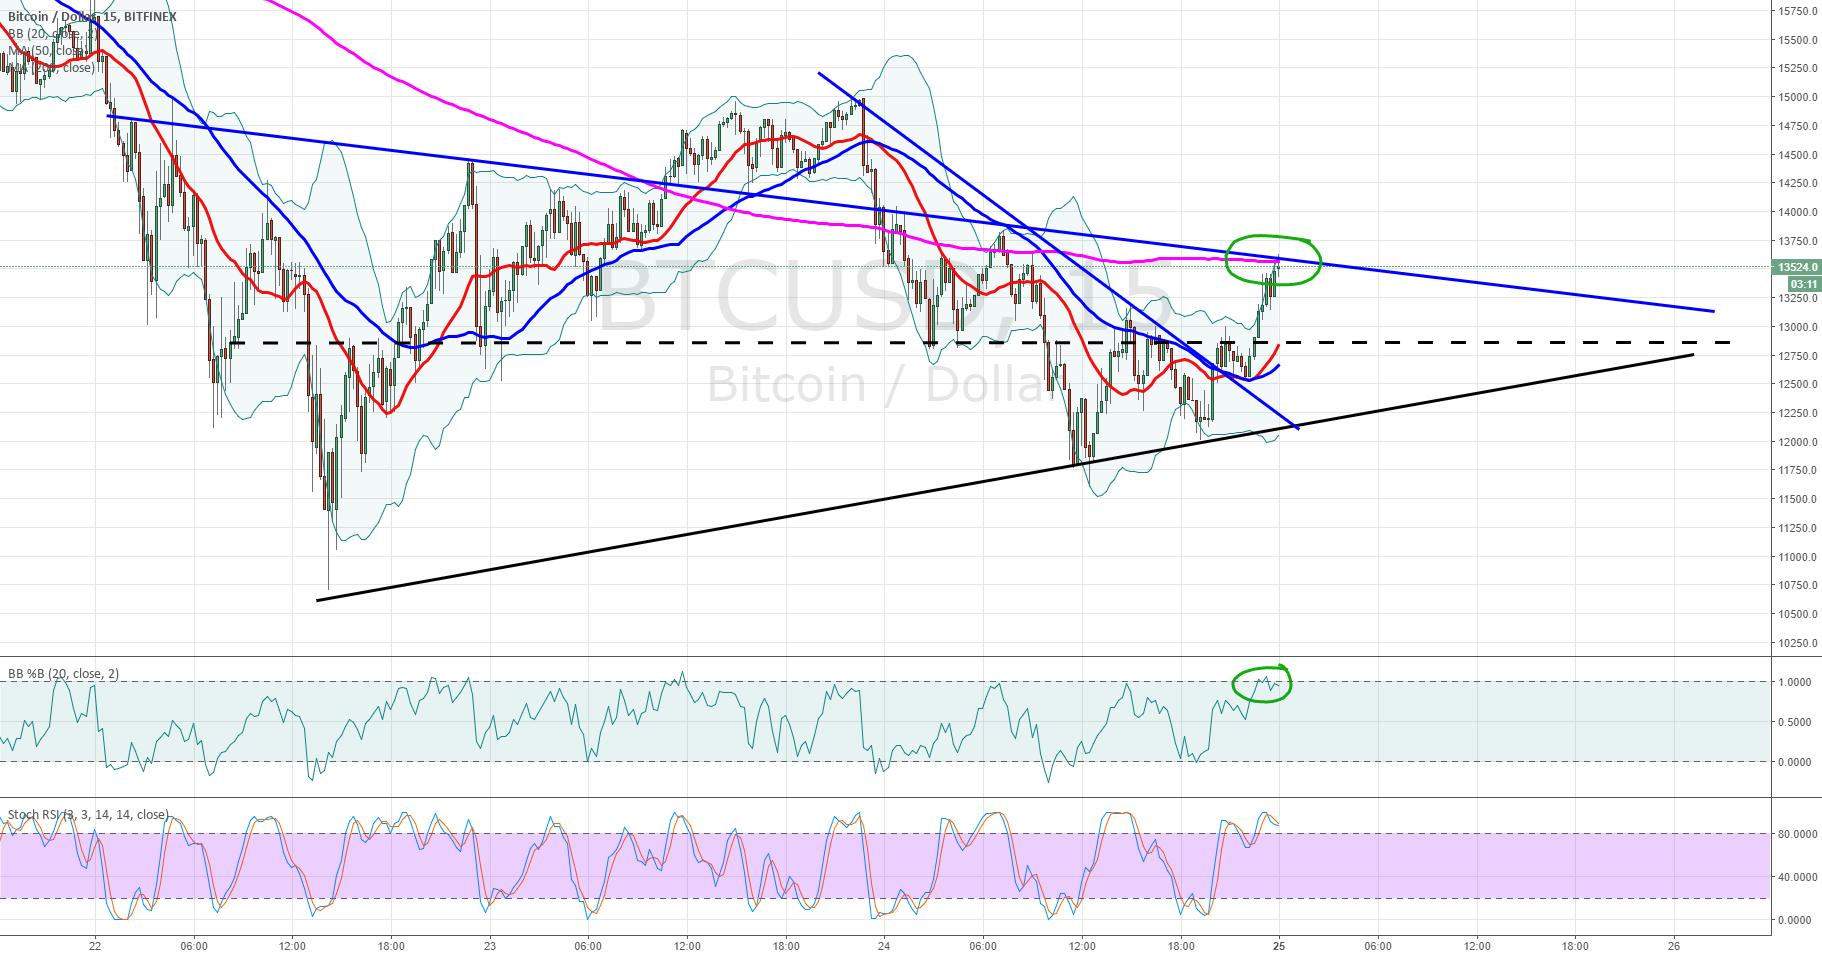 BTCUSD trend line analysis 15 Minute chart